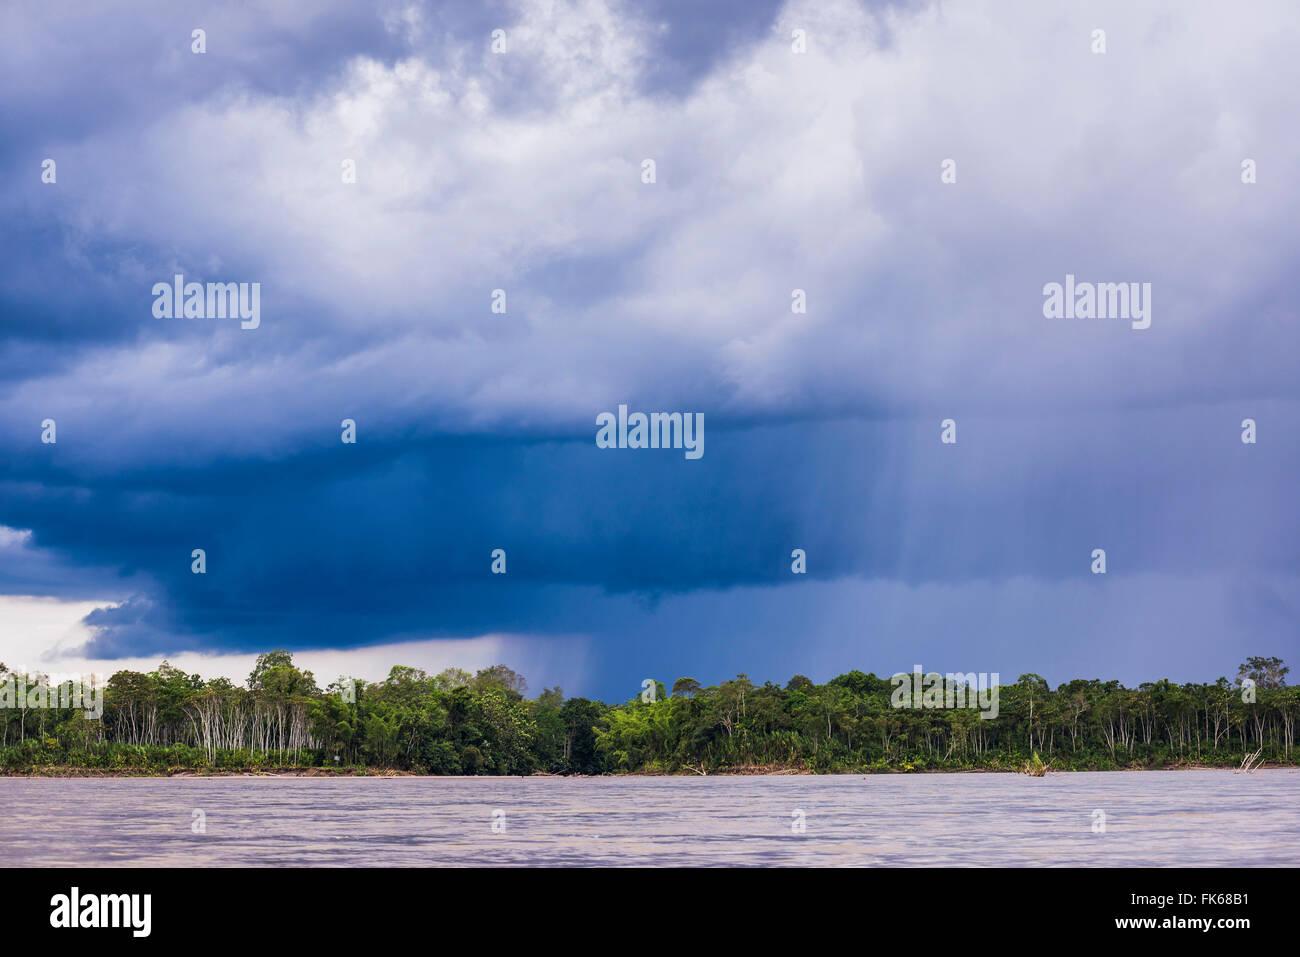 Amazon Rainforest tormenta, Coca, Ecuador, Sudamérica Imagen De Stock